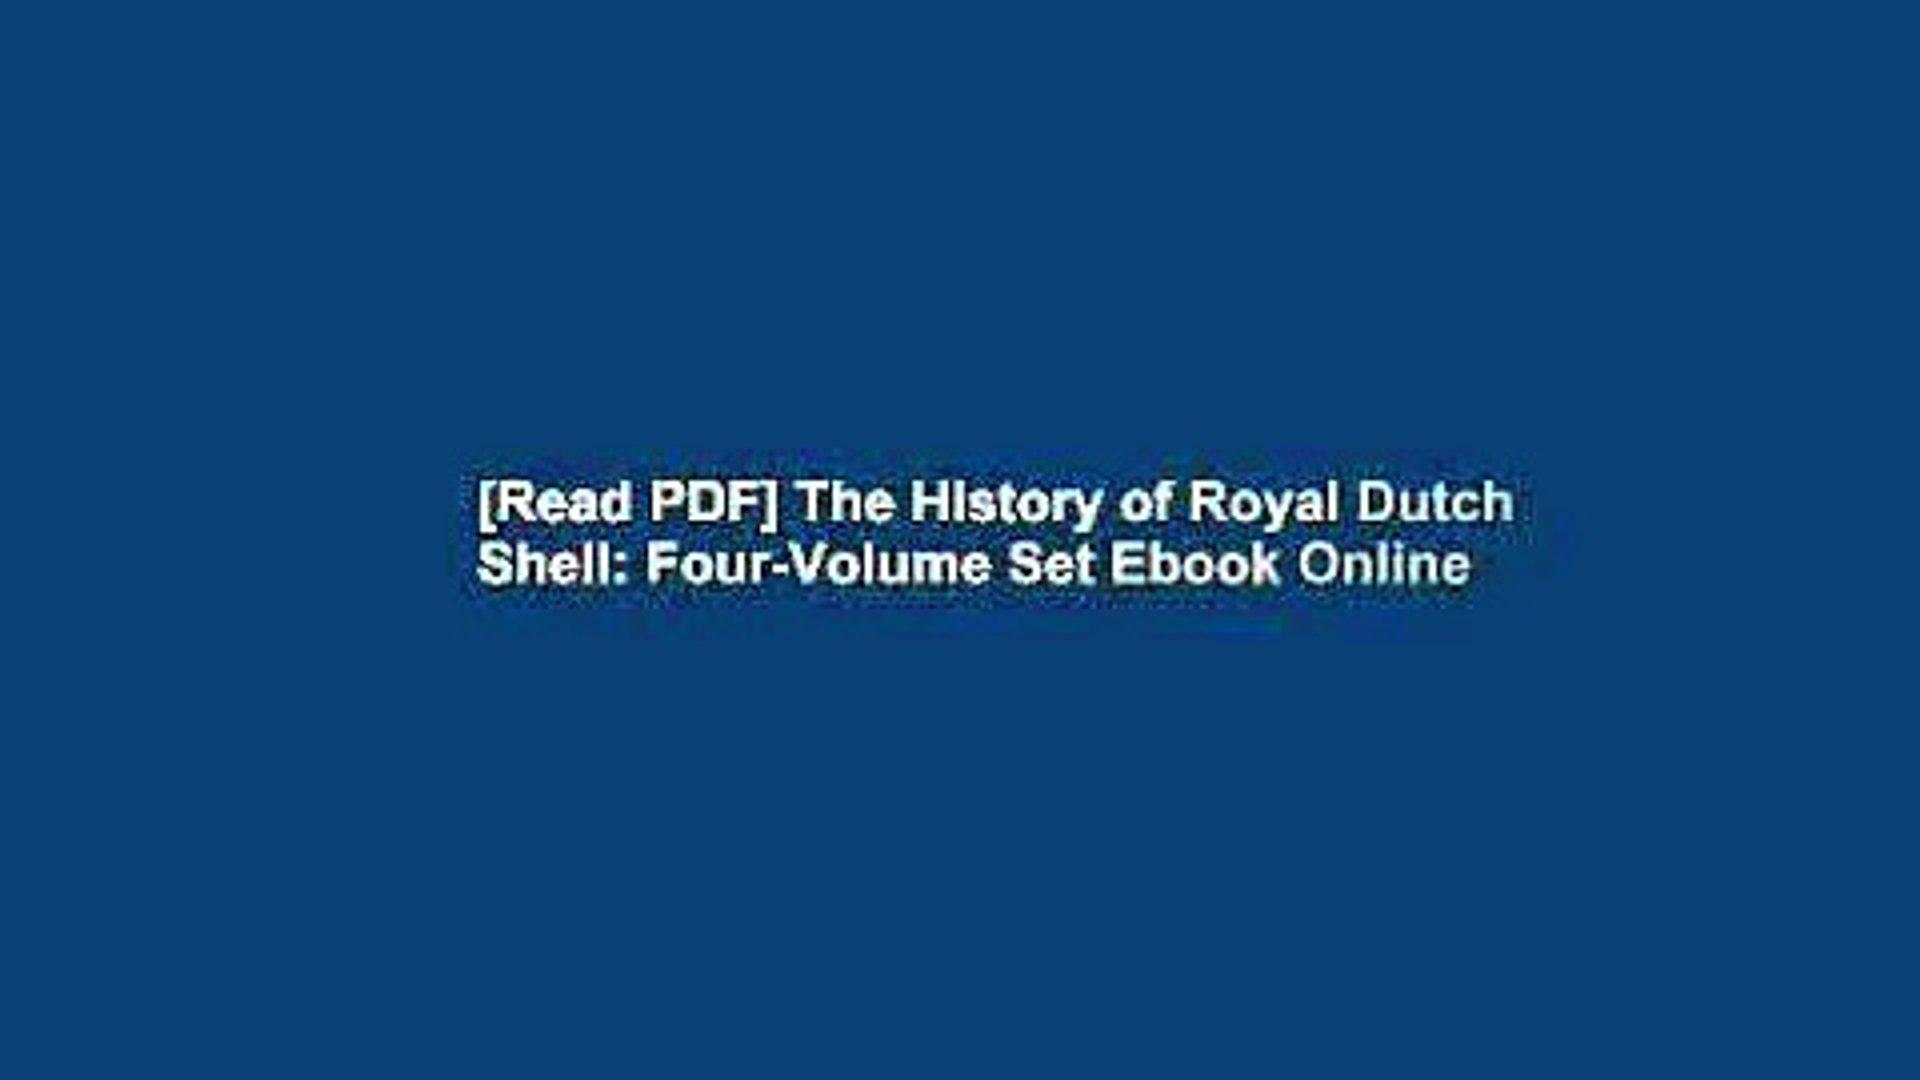 [Read PDF] The History of Royal Dutch Shell: Four-Volume Set Ebook Online